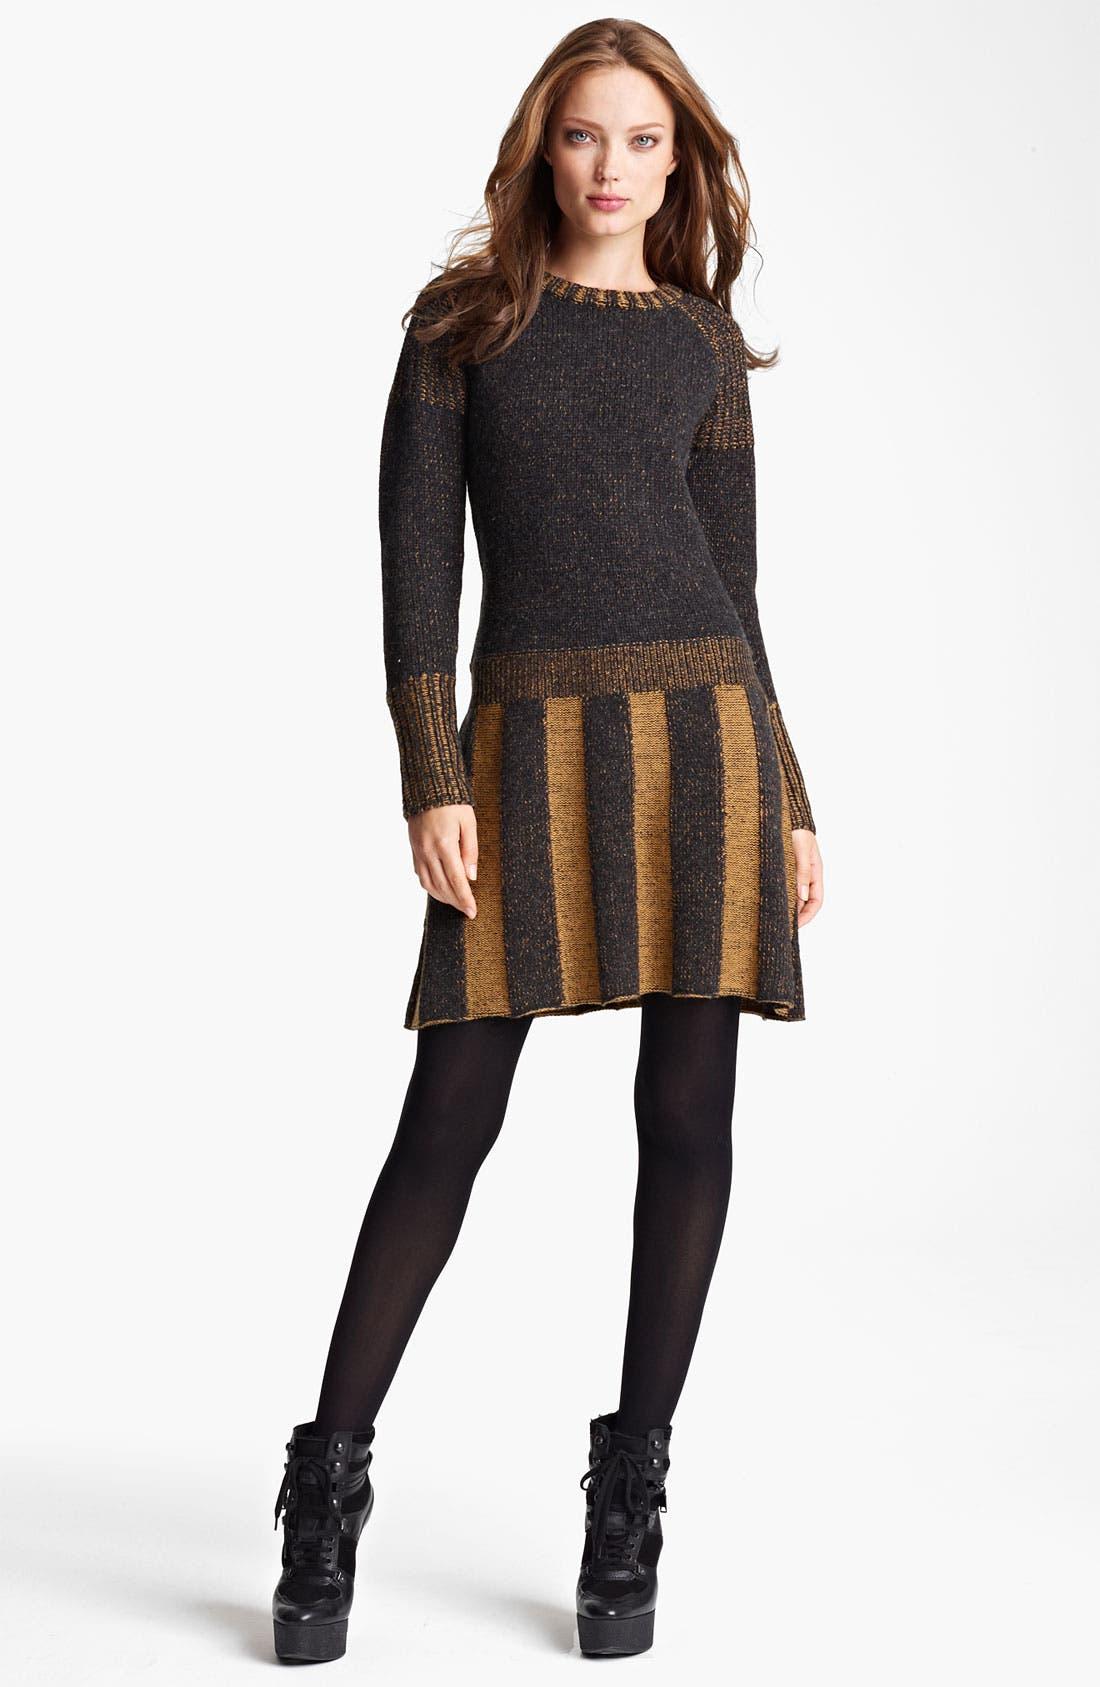 Alternate Image 1 Selected - Burberry Brit Drop Waist Sweater Dress